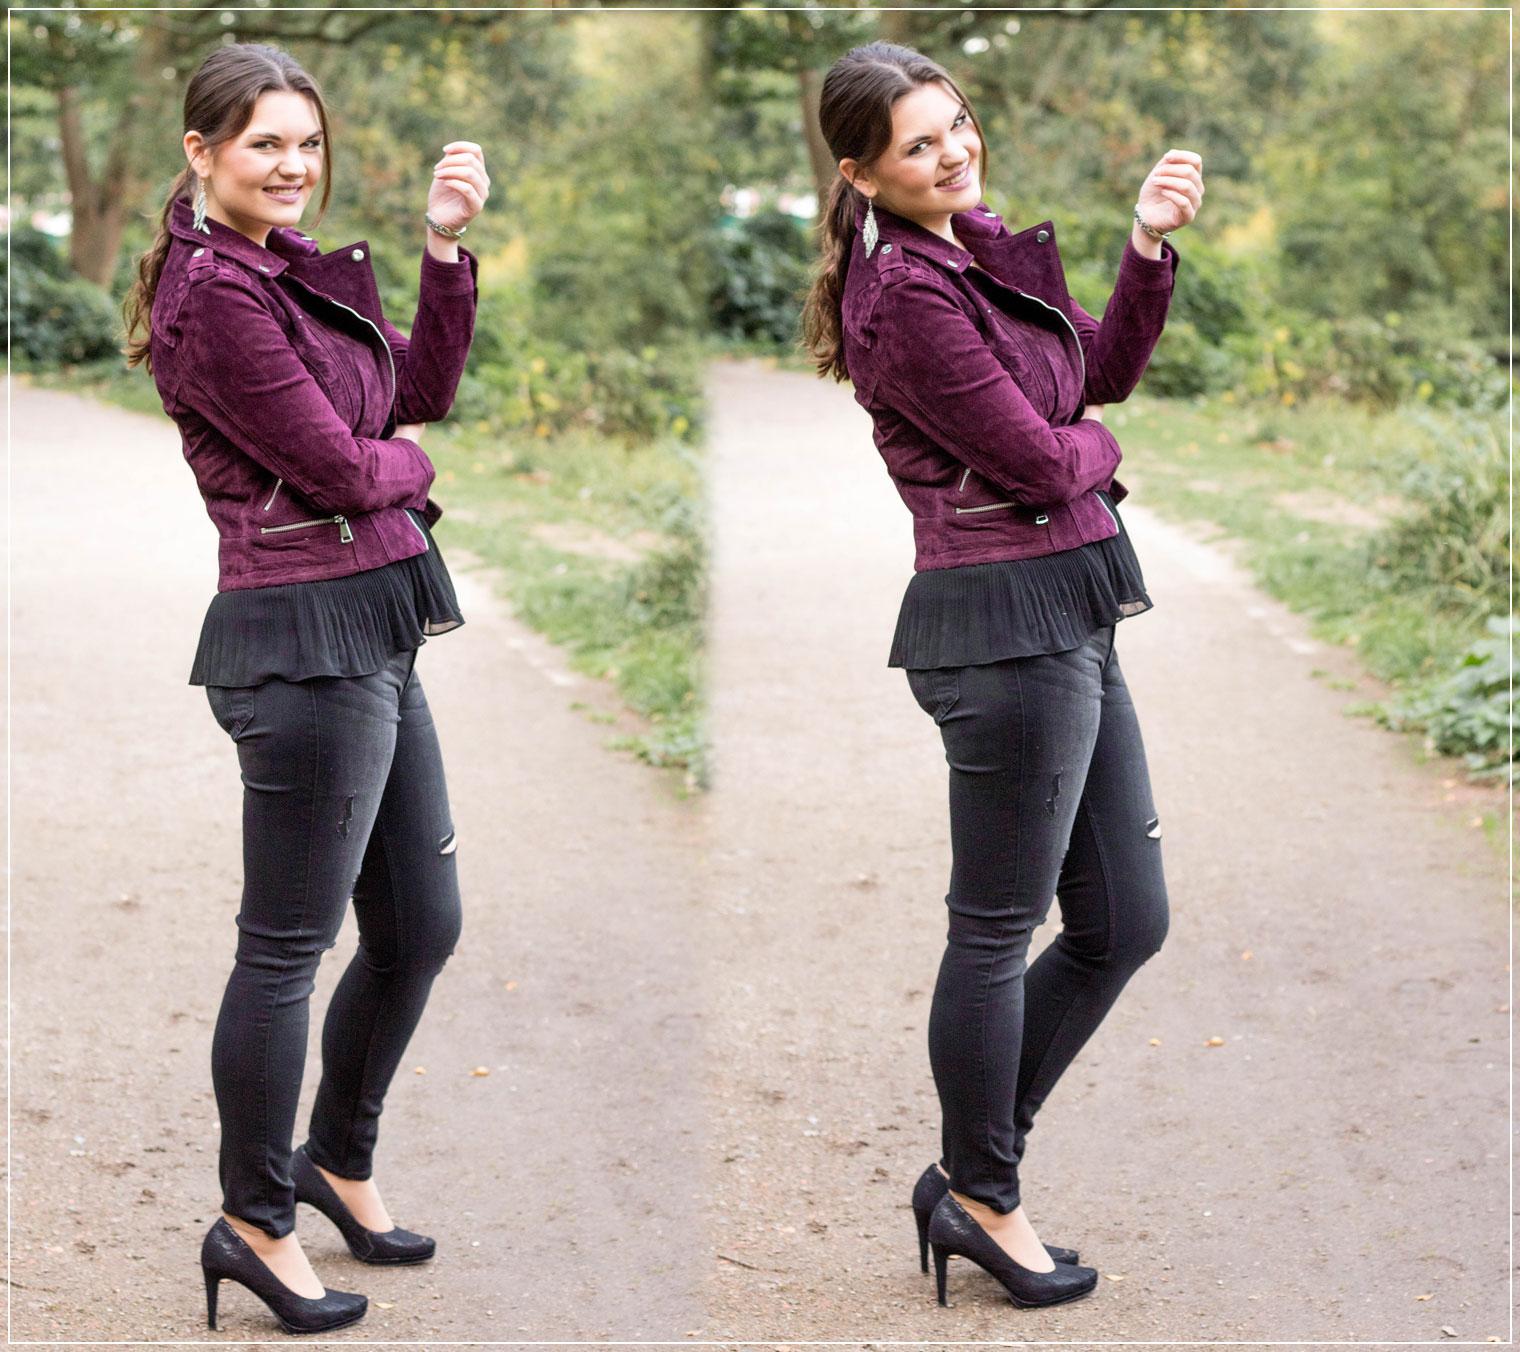 Beerentöne, Wildlederjacke, Material Mix, Trendfarbe, Modetrend, eleganter Style, Herbstoutfit, Herbstlook, Outfitinspiration, Autumnstyle, Abendoutfit, Modebloggerin, Fashionbloggerin, Modeblog, Ruhrgebiet